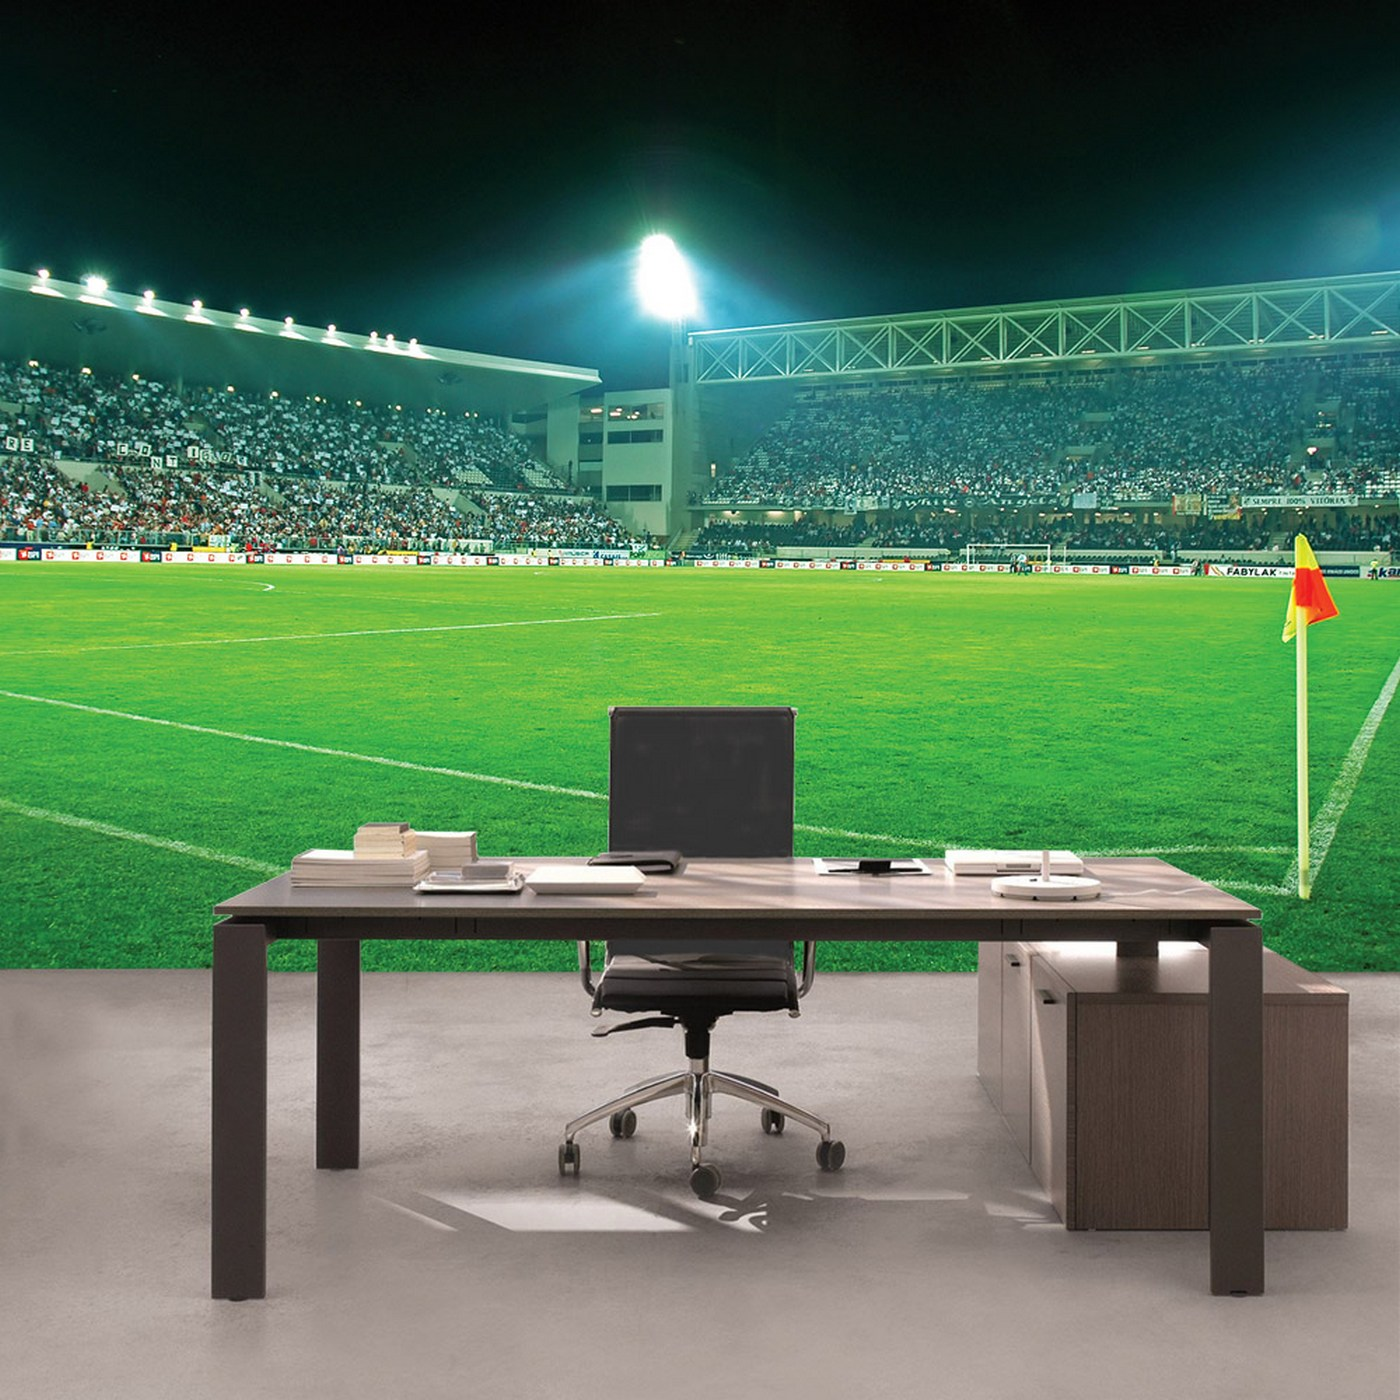 Vlies Fototapete 2525 Sport Tapete Fussball Stadion Flutlicht Rasen Tribune Grun